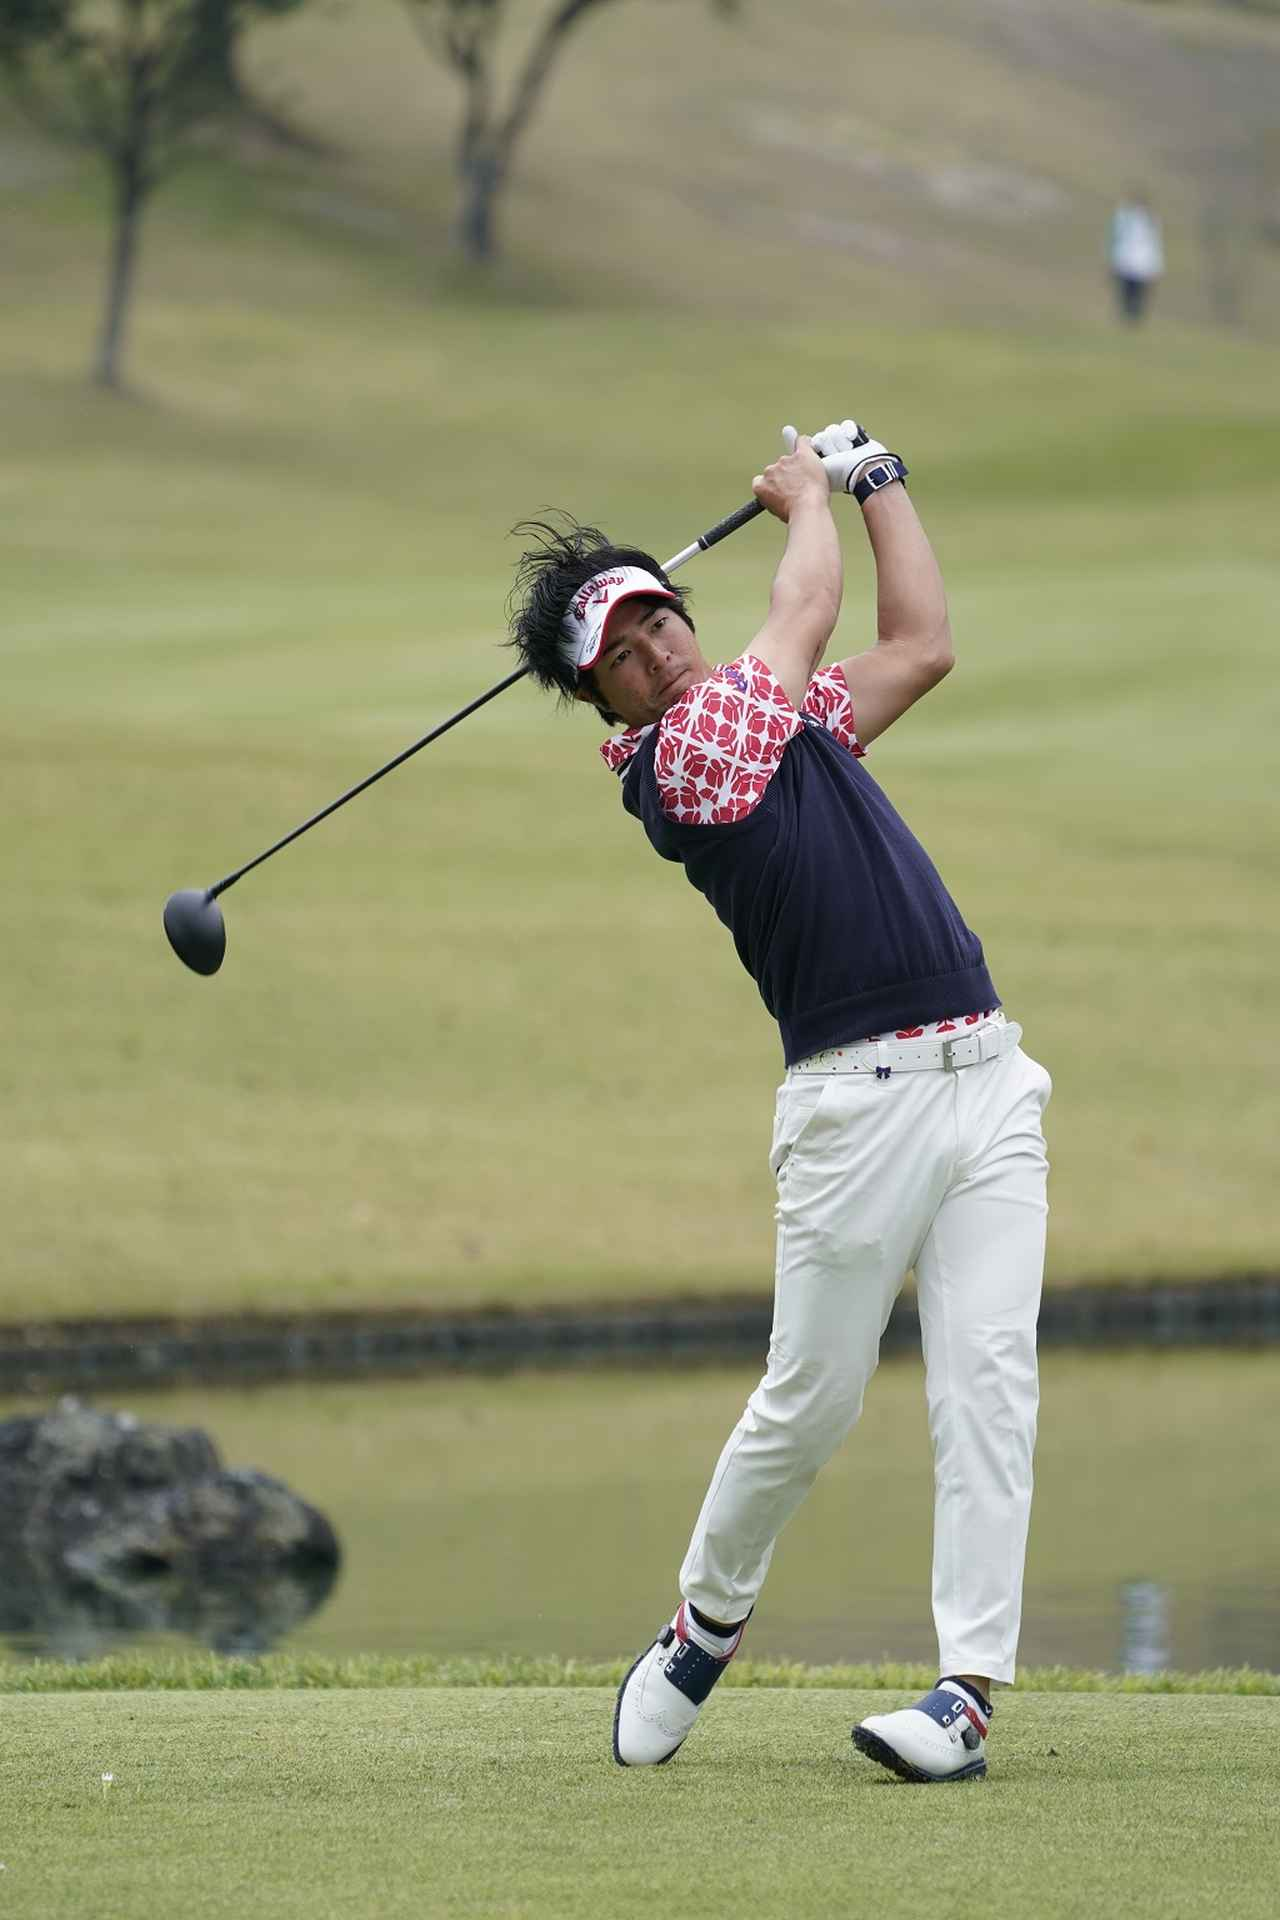 Images : 16番目の画像 - 石川遼ドライバー前方連続写真 - みんなのゴルフダイジェスト